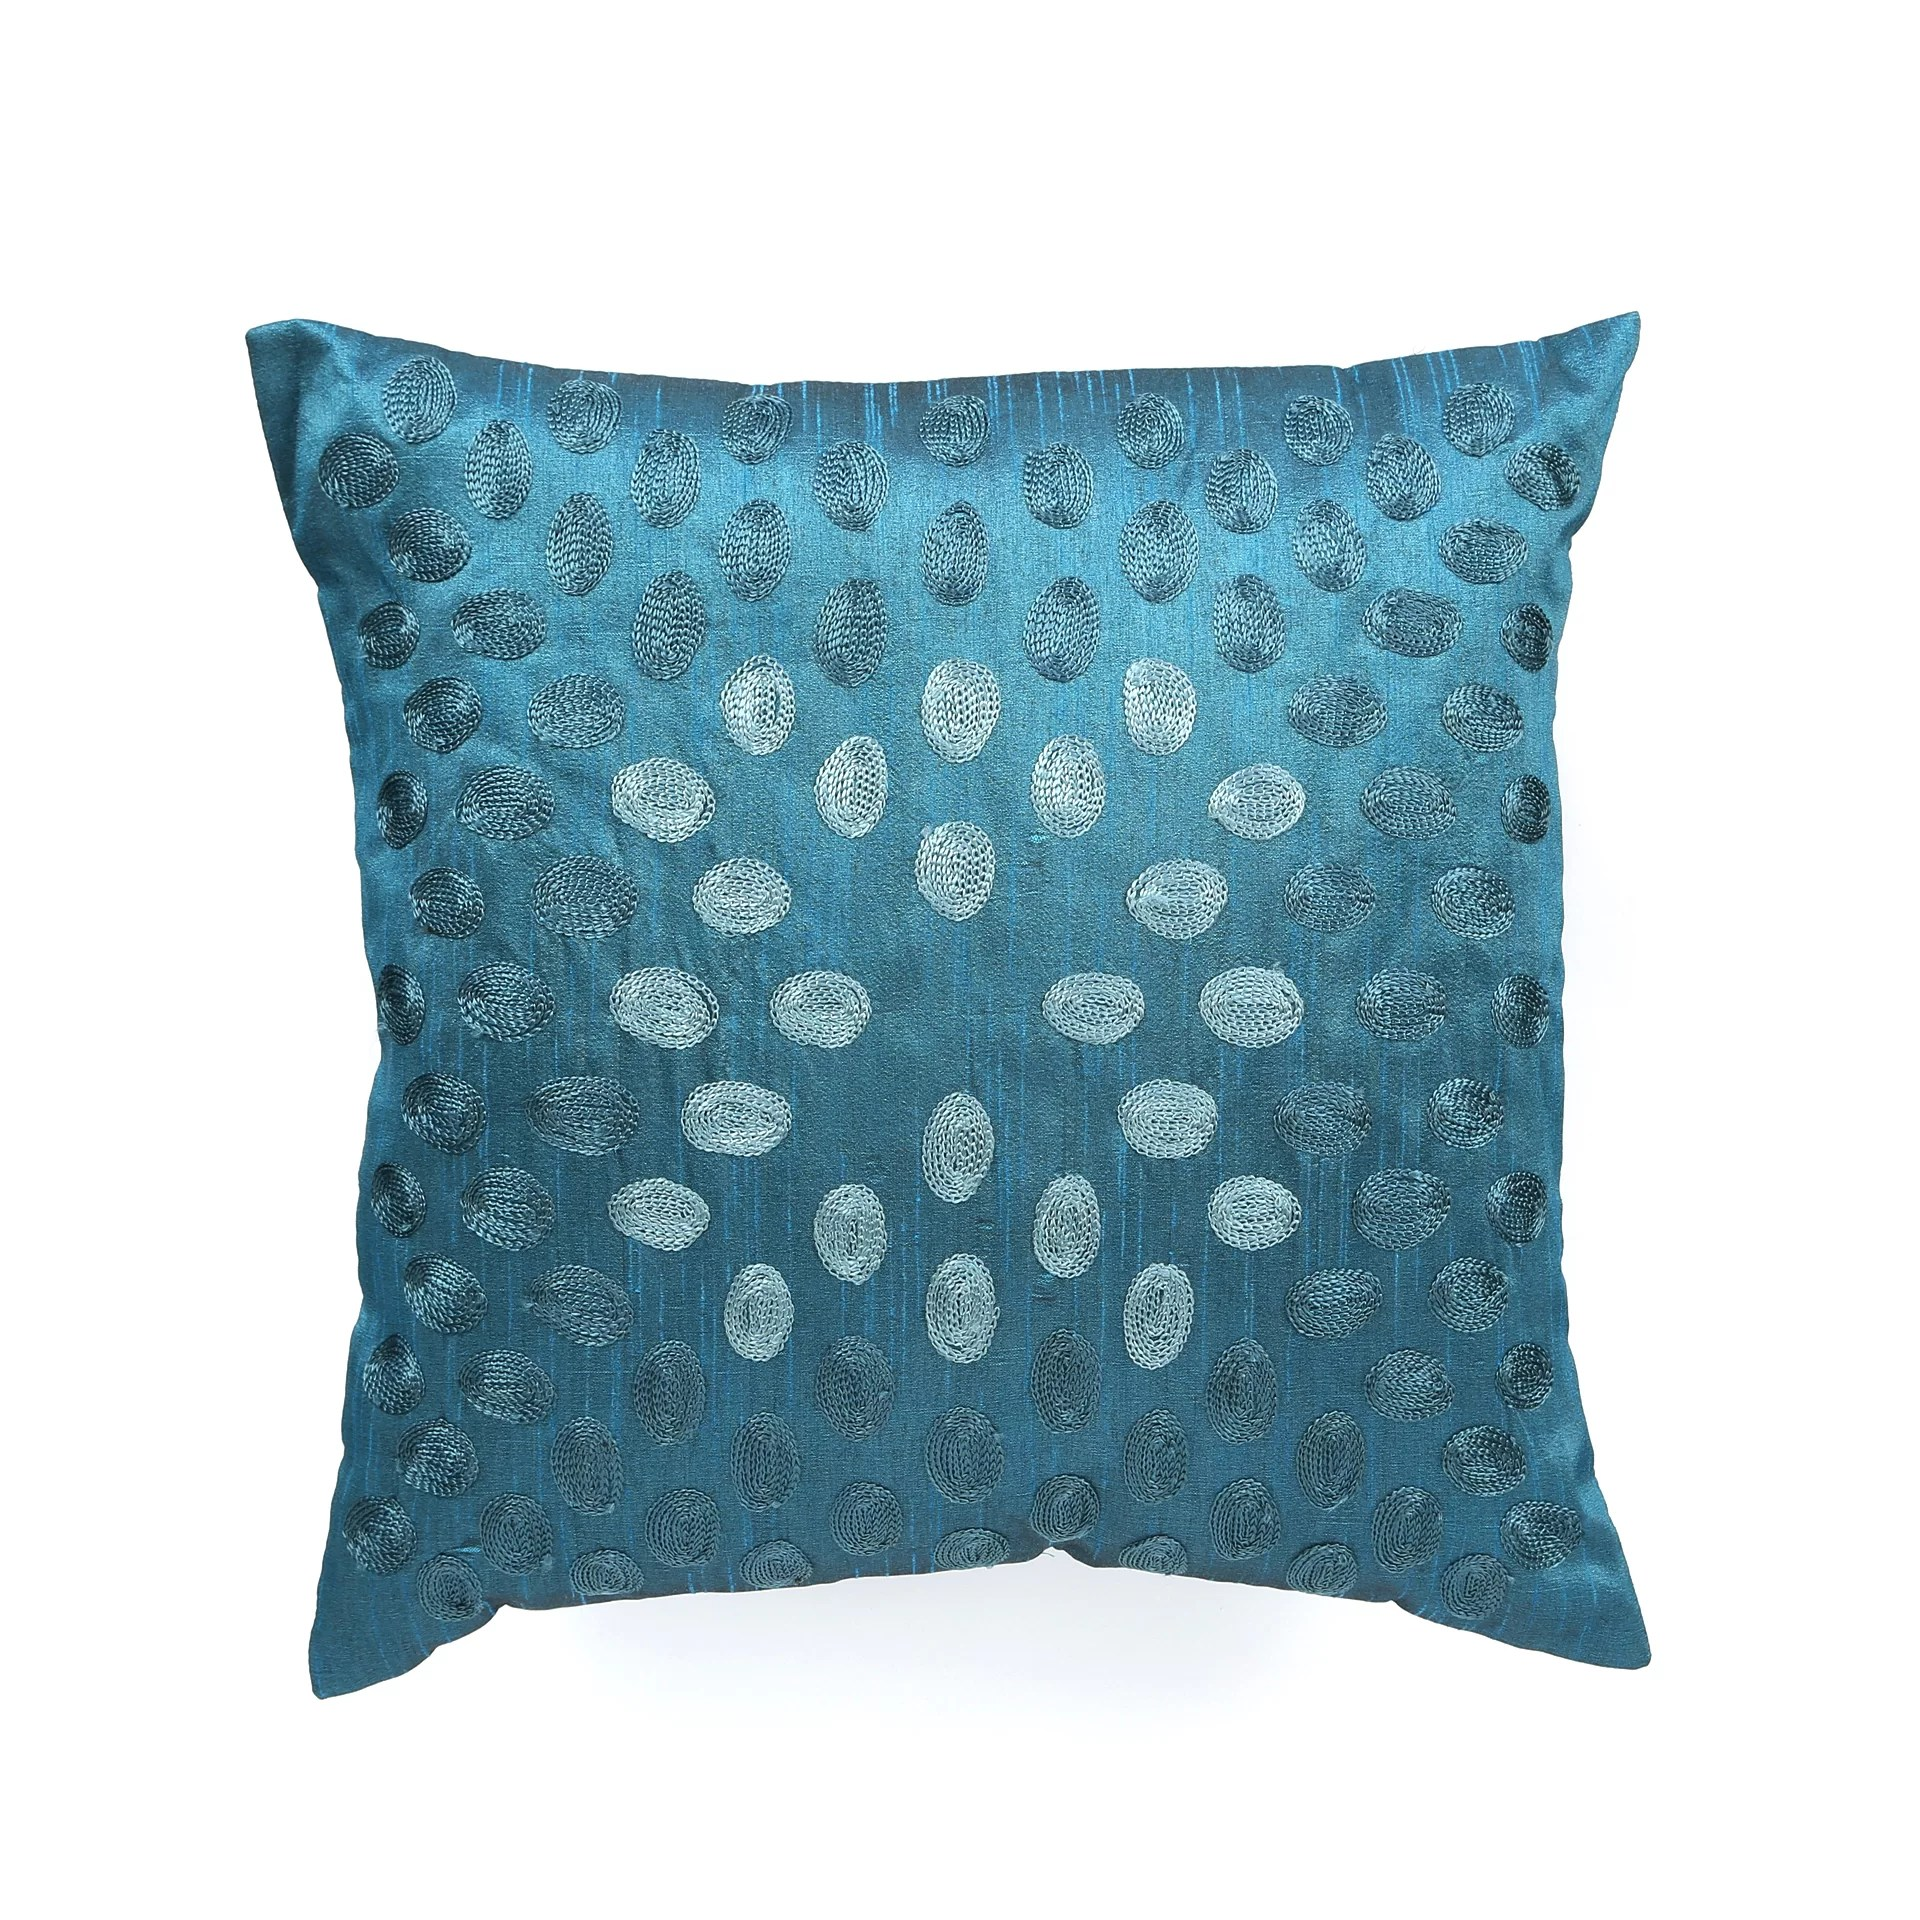 Wildon Home  Throw Pillow & Reviews